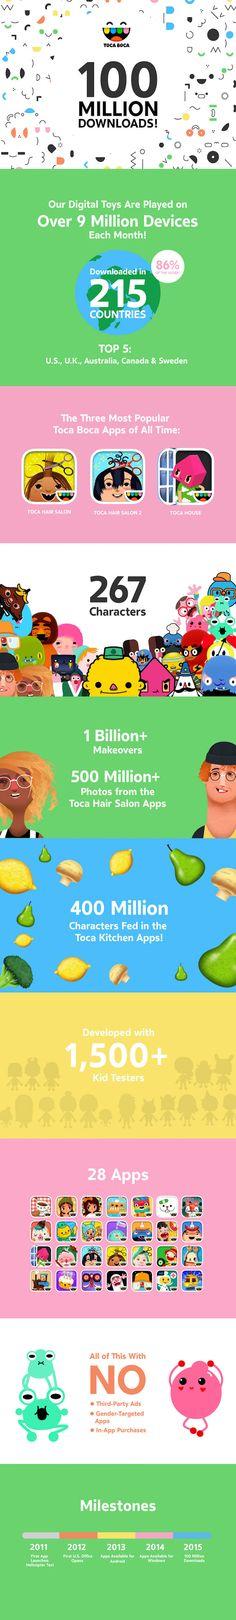 Toca Boca app developers reach 100  Million downloads